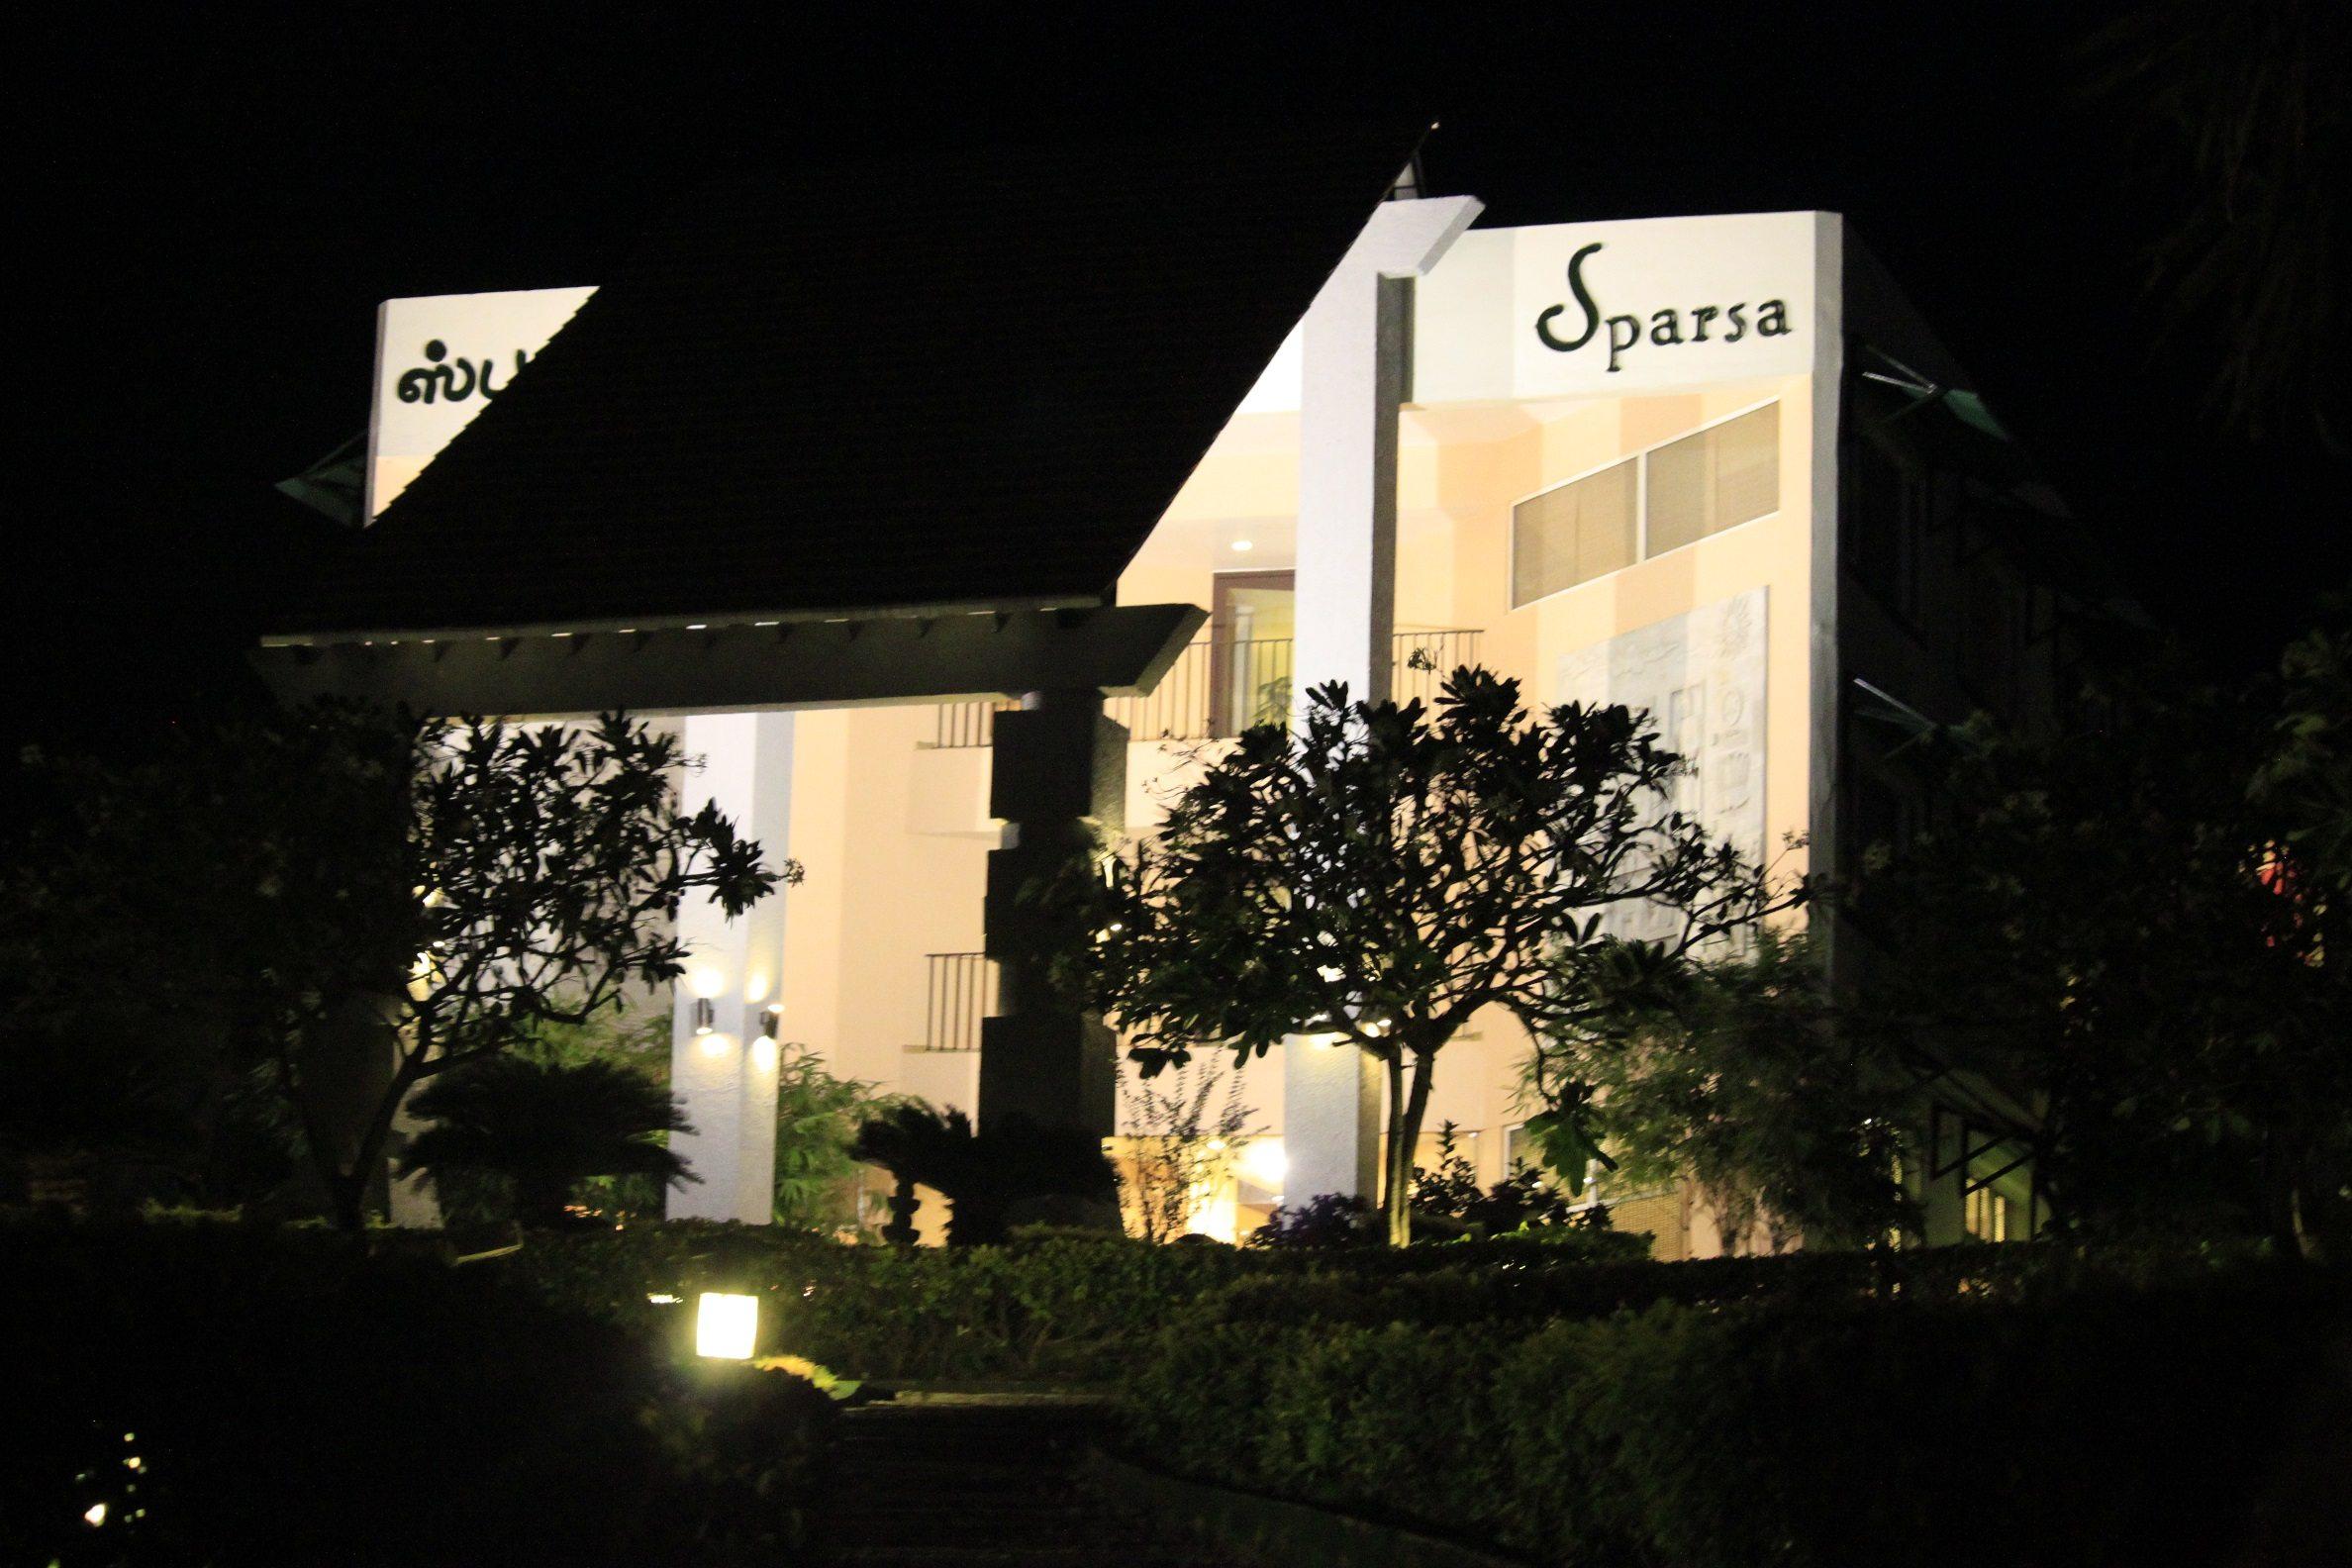 Sparsa Hotel